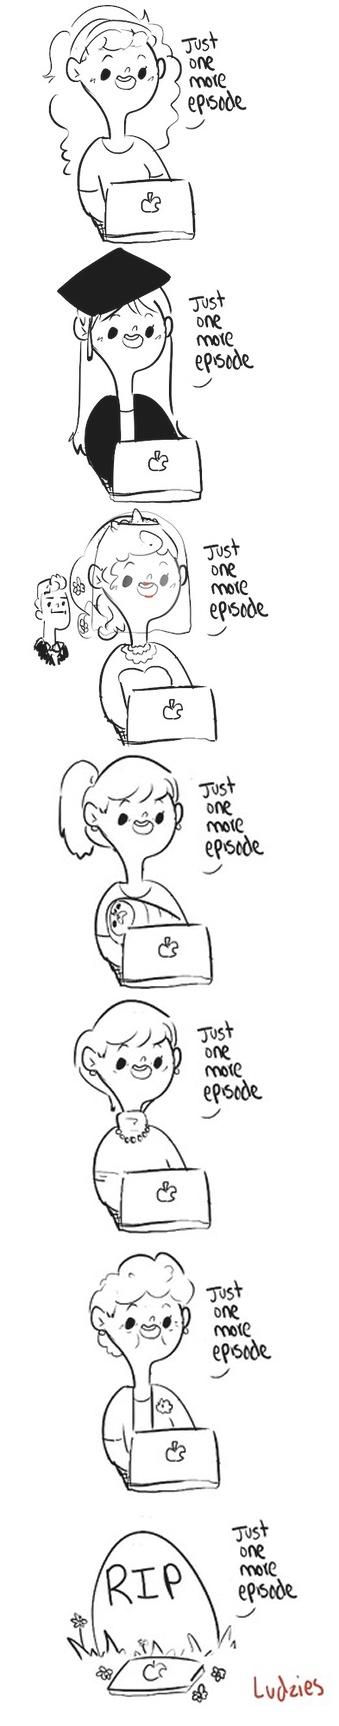 modern living,TV,funny,web comics